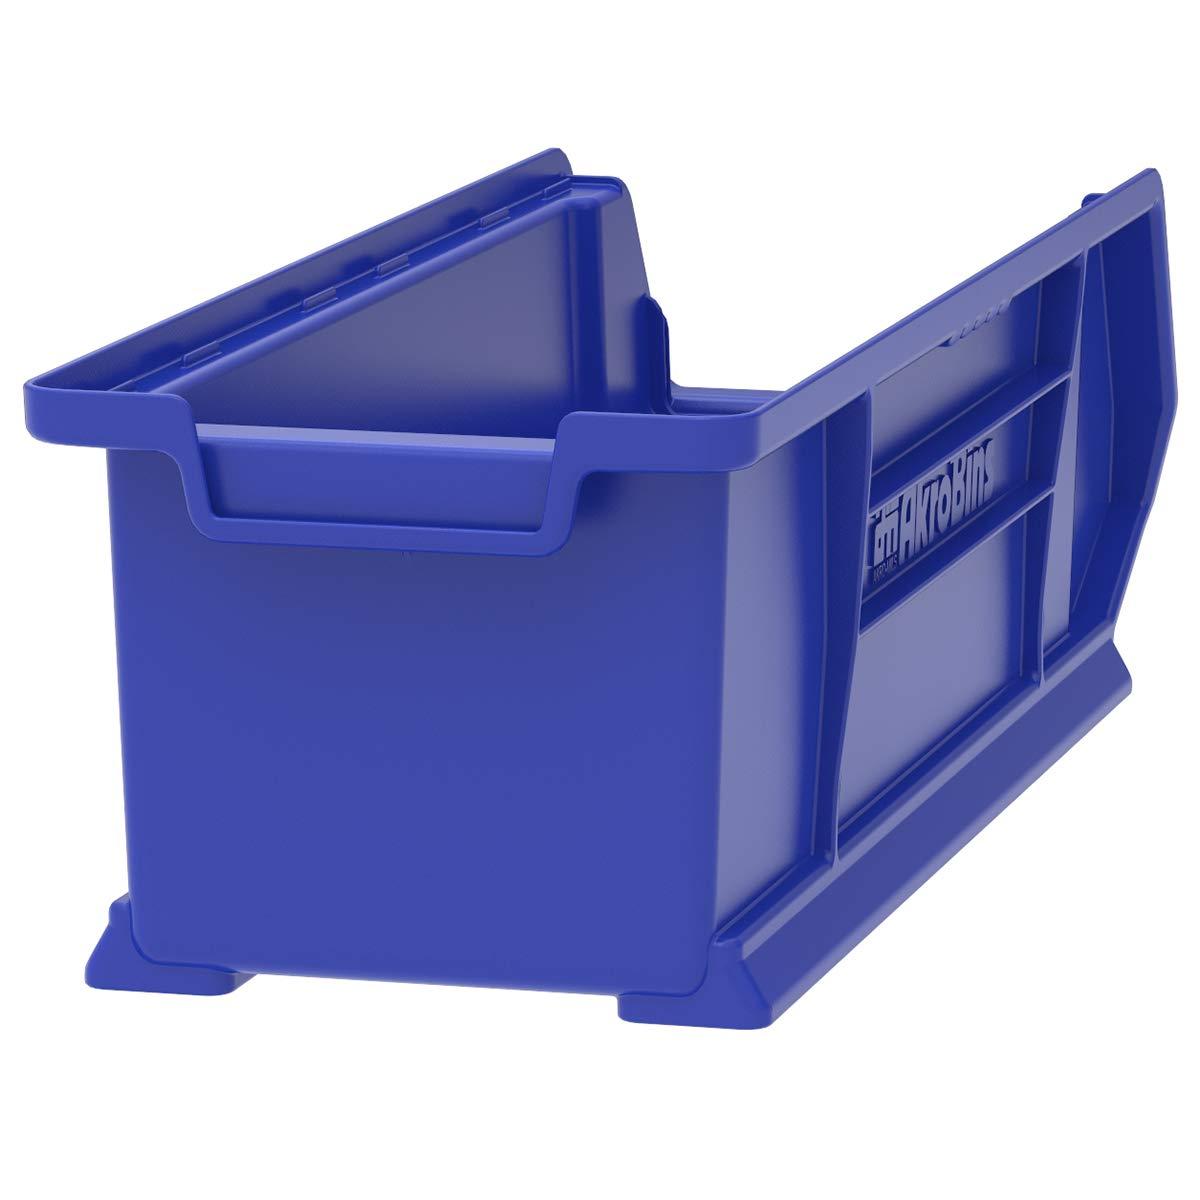 Akro-Mils 30284 Super Size Plastic Stacking Storage Akro Bin, 24-Inch Diameter by 8-Inch Width by 7-Inch Height, Blue, Case of 4 by Akro-Mils (Image #2)